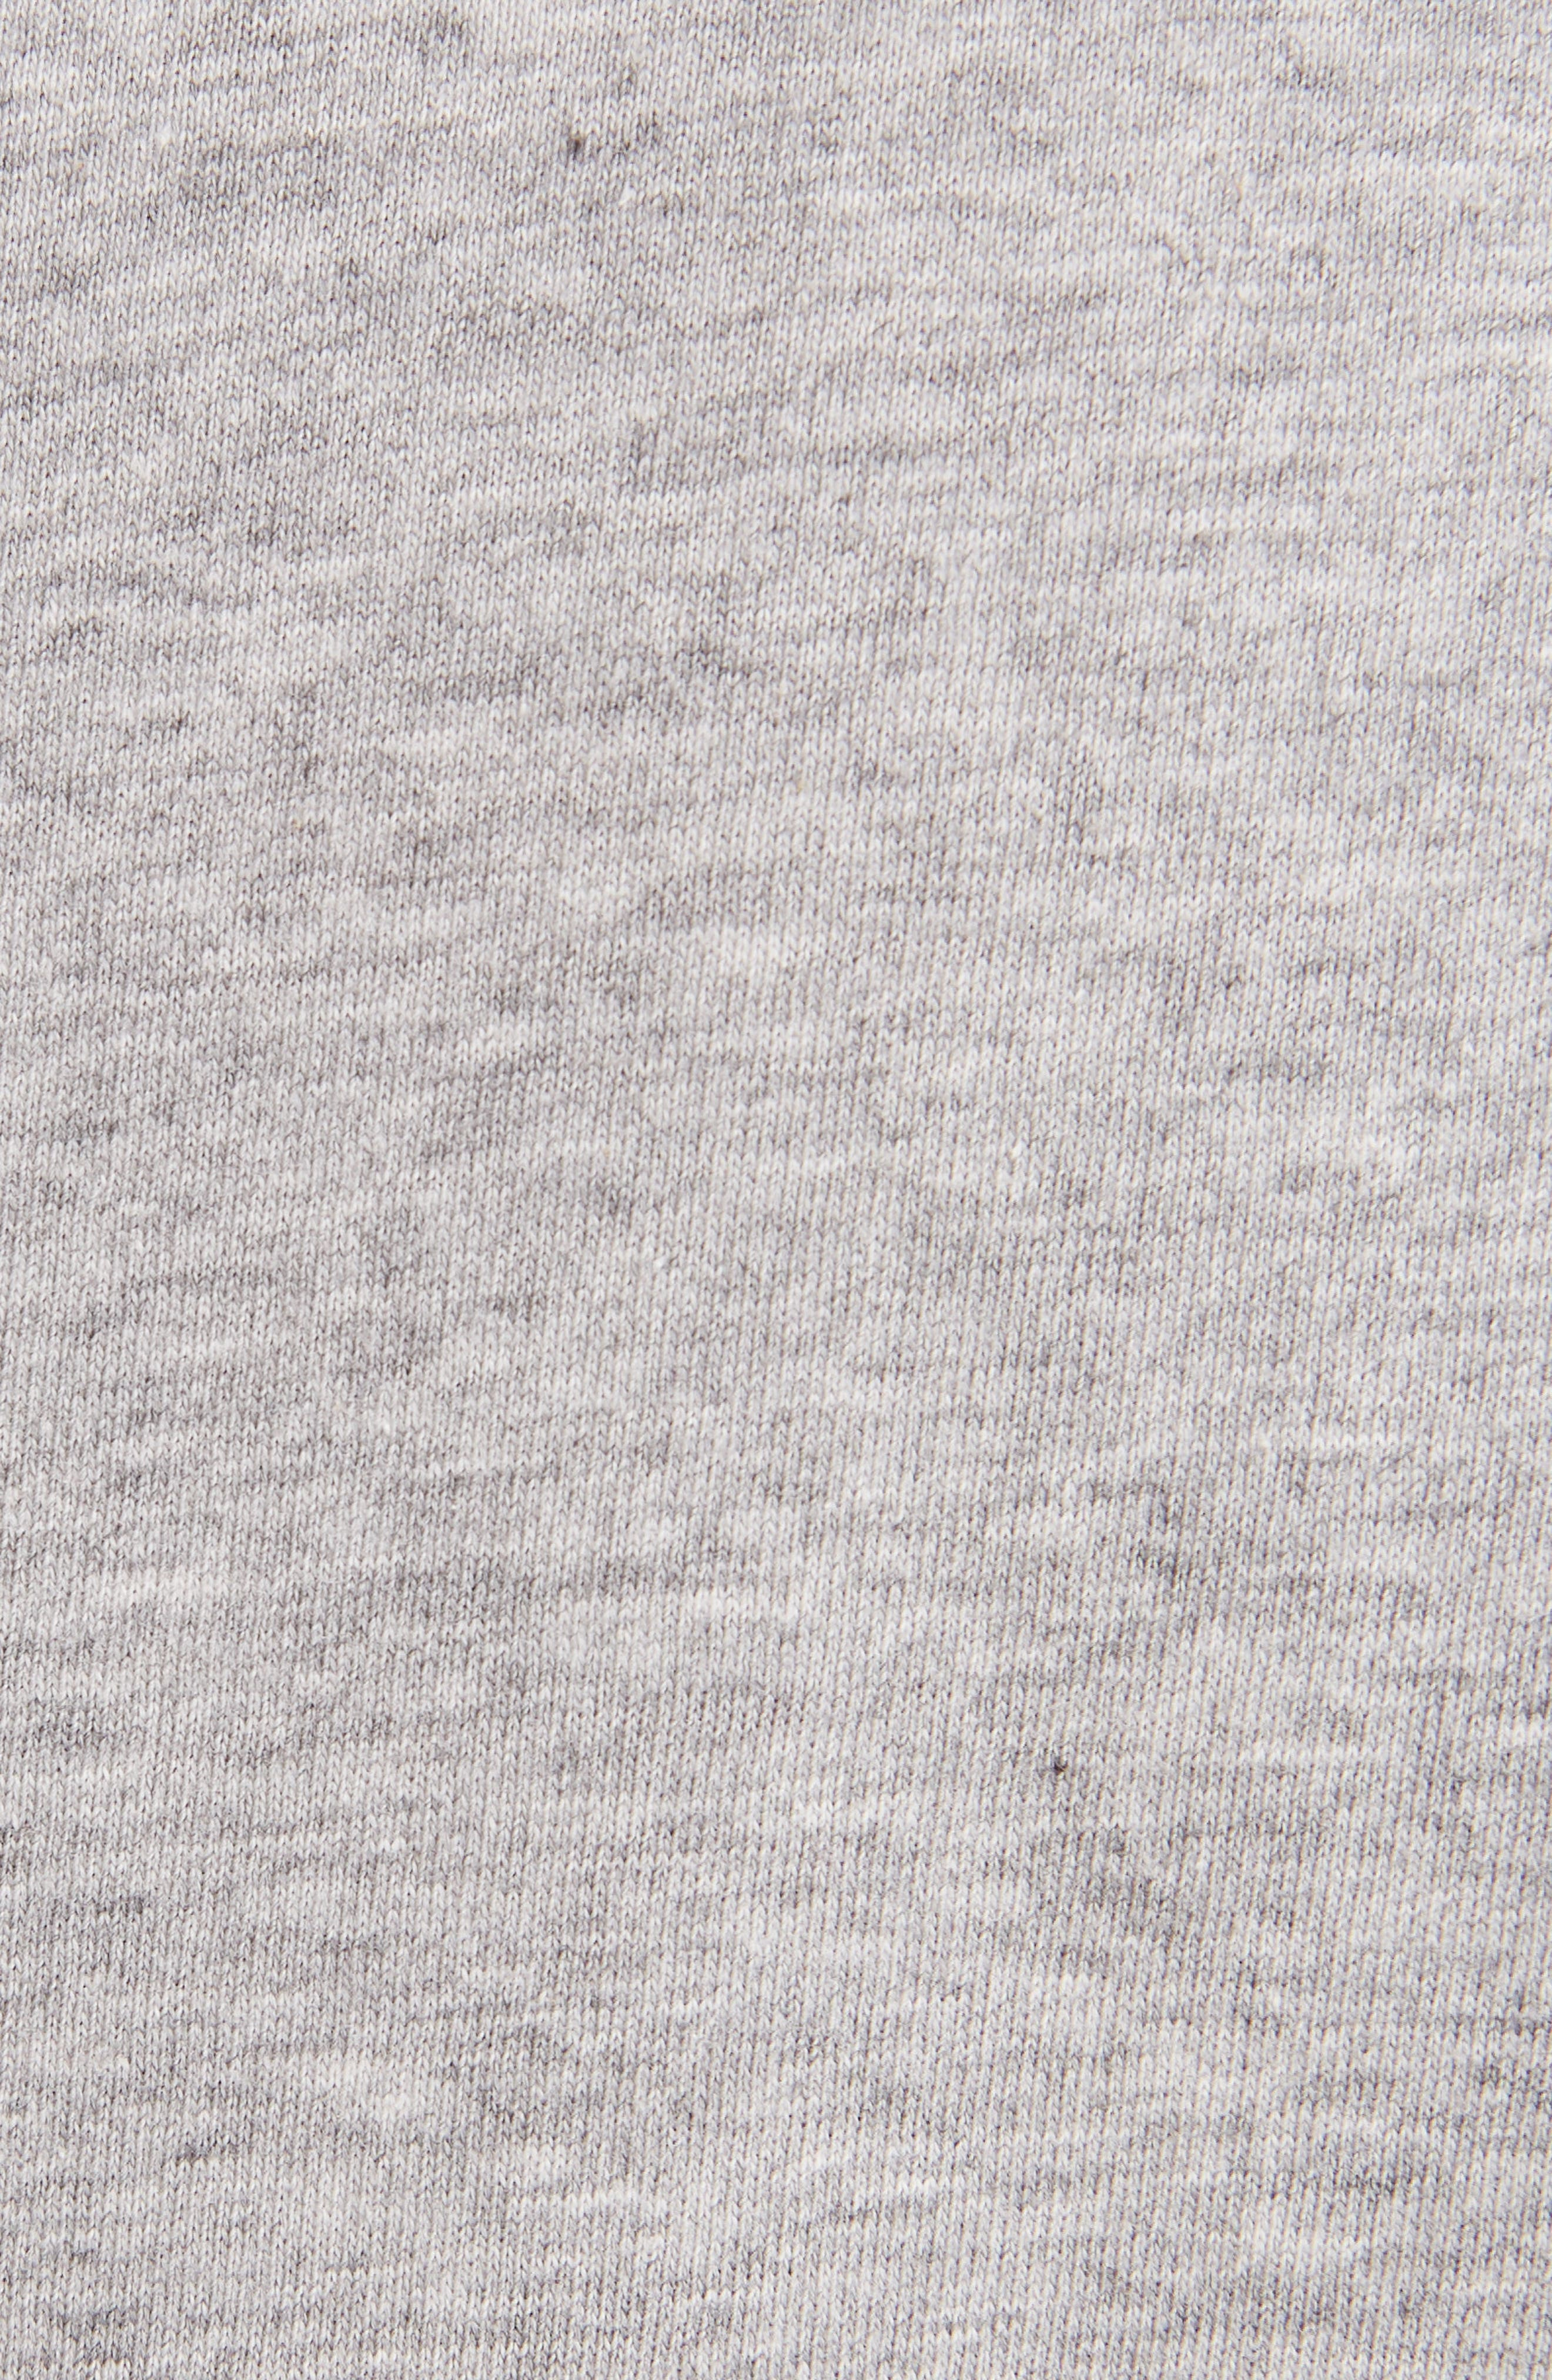 Mesh Jersey Crewneck T-Shirt,                             Alternate thumbnail 5, color,